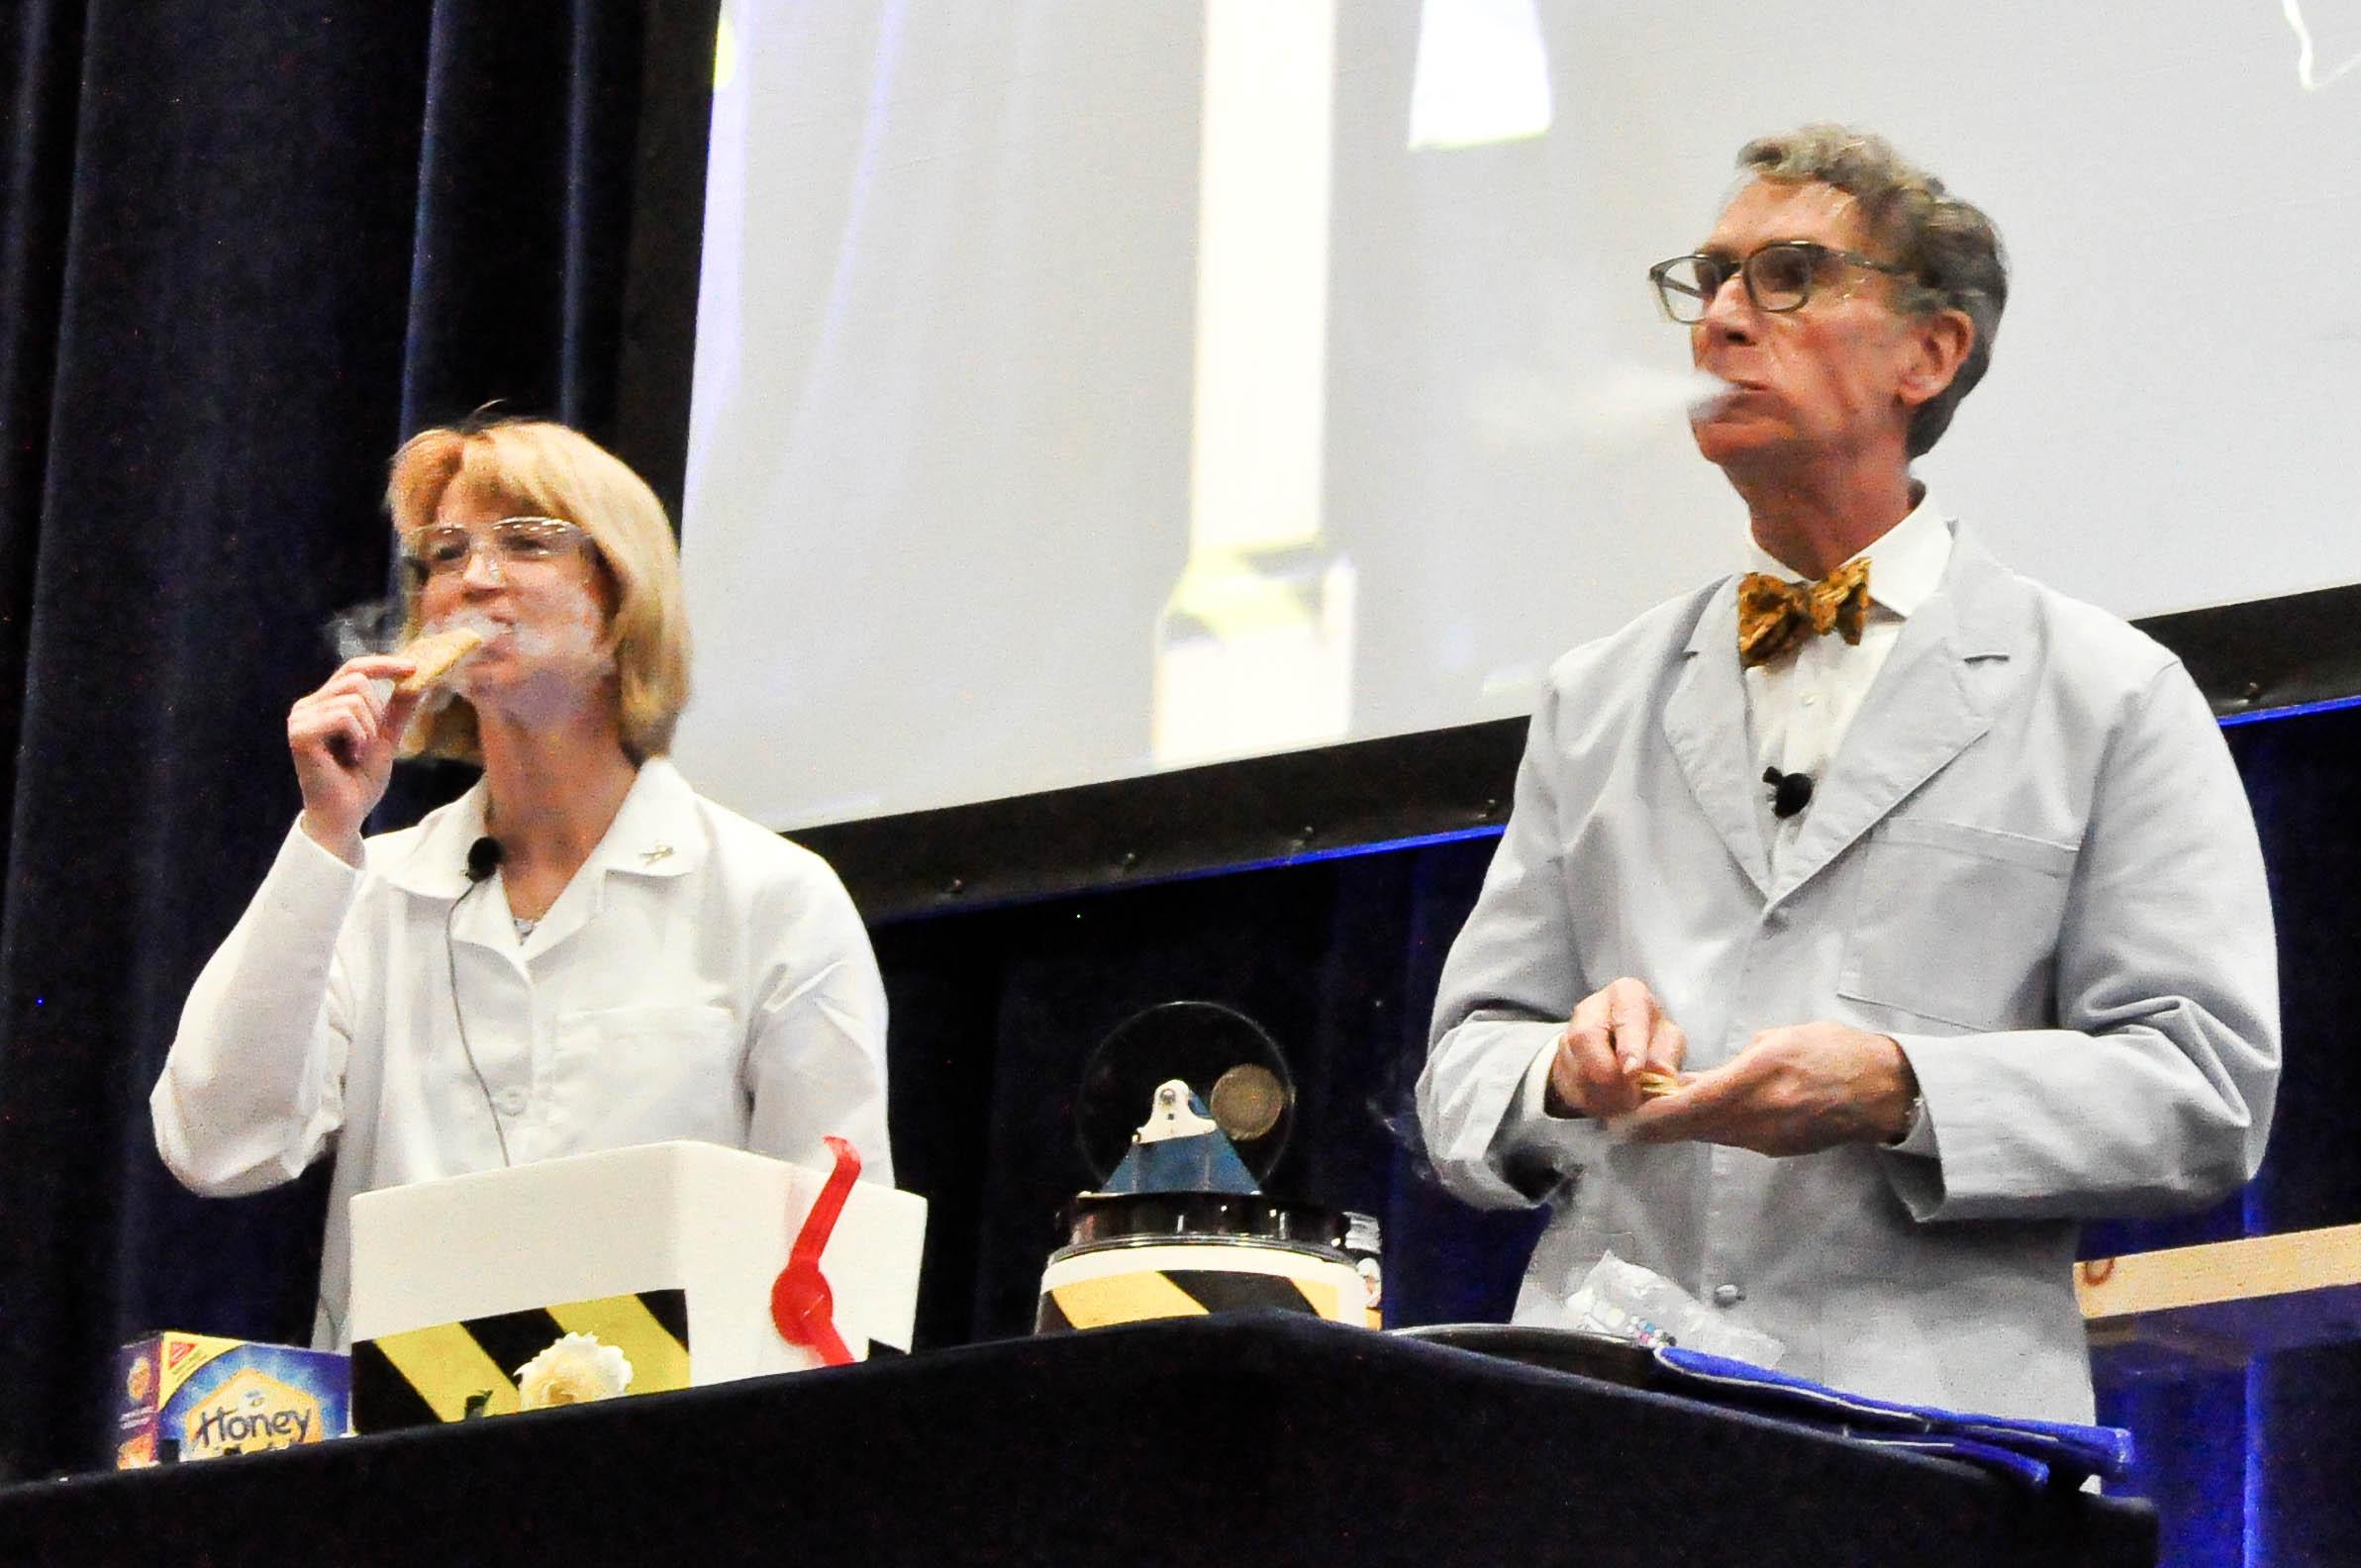 2014 USA Science & Engineering Festival